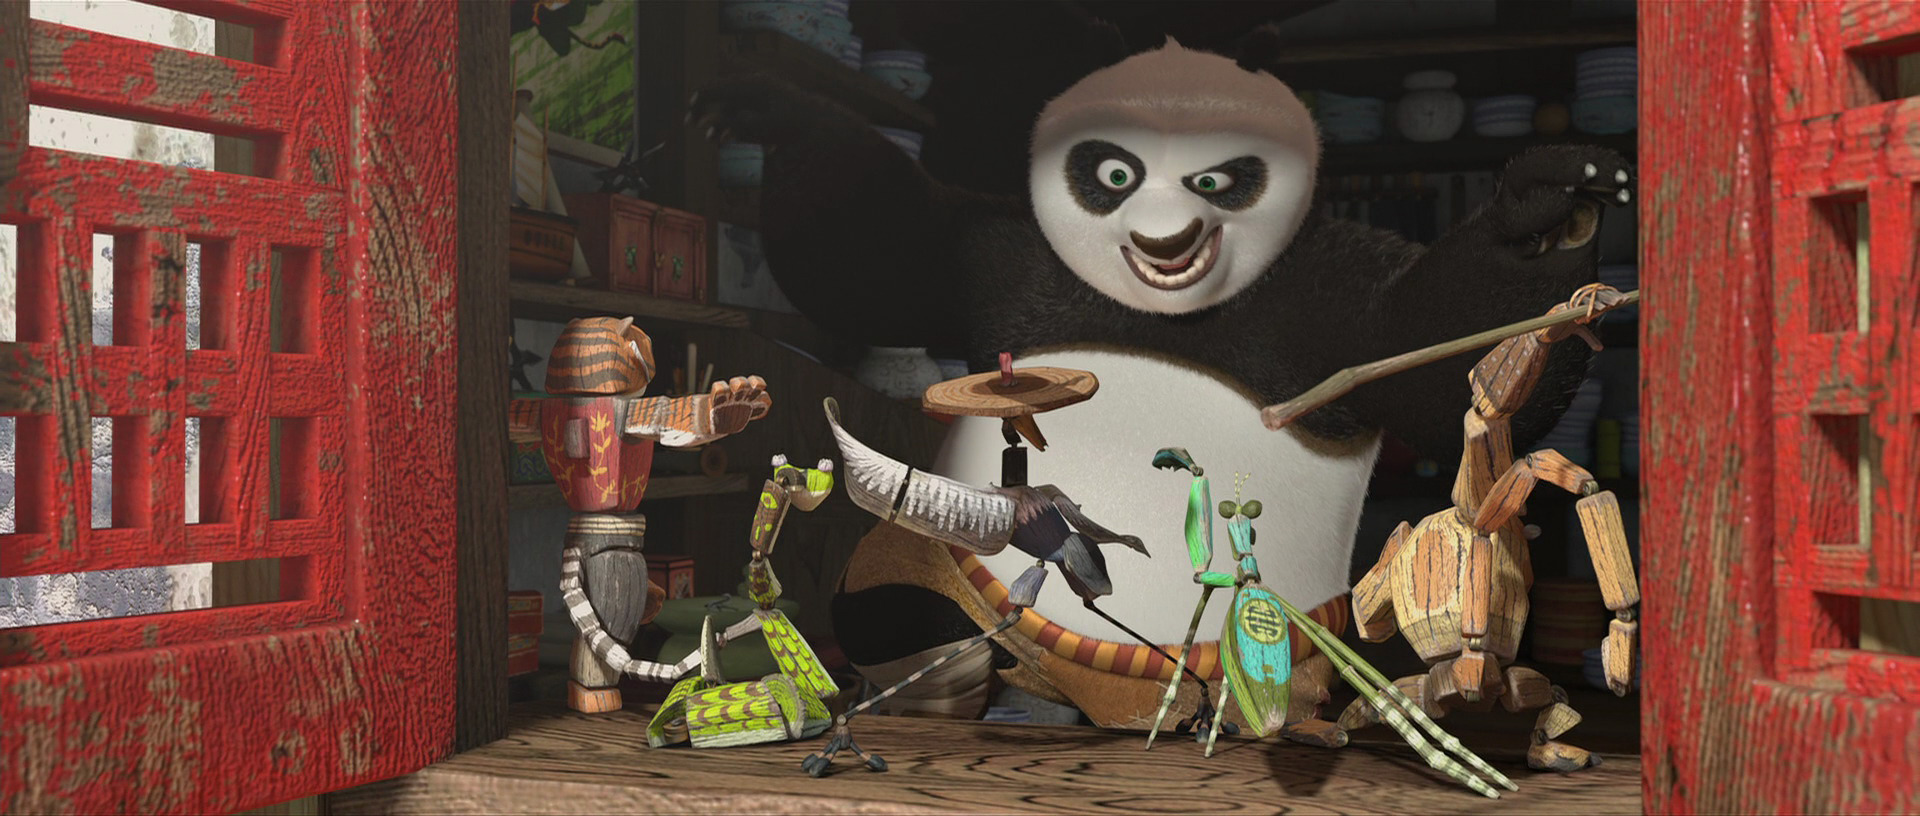 Furious Five Action Figures Kung Fu Panda Wiki Fandom Powered By